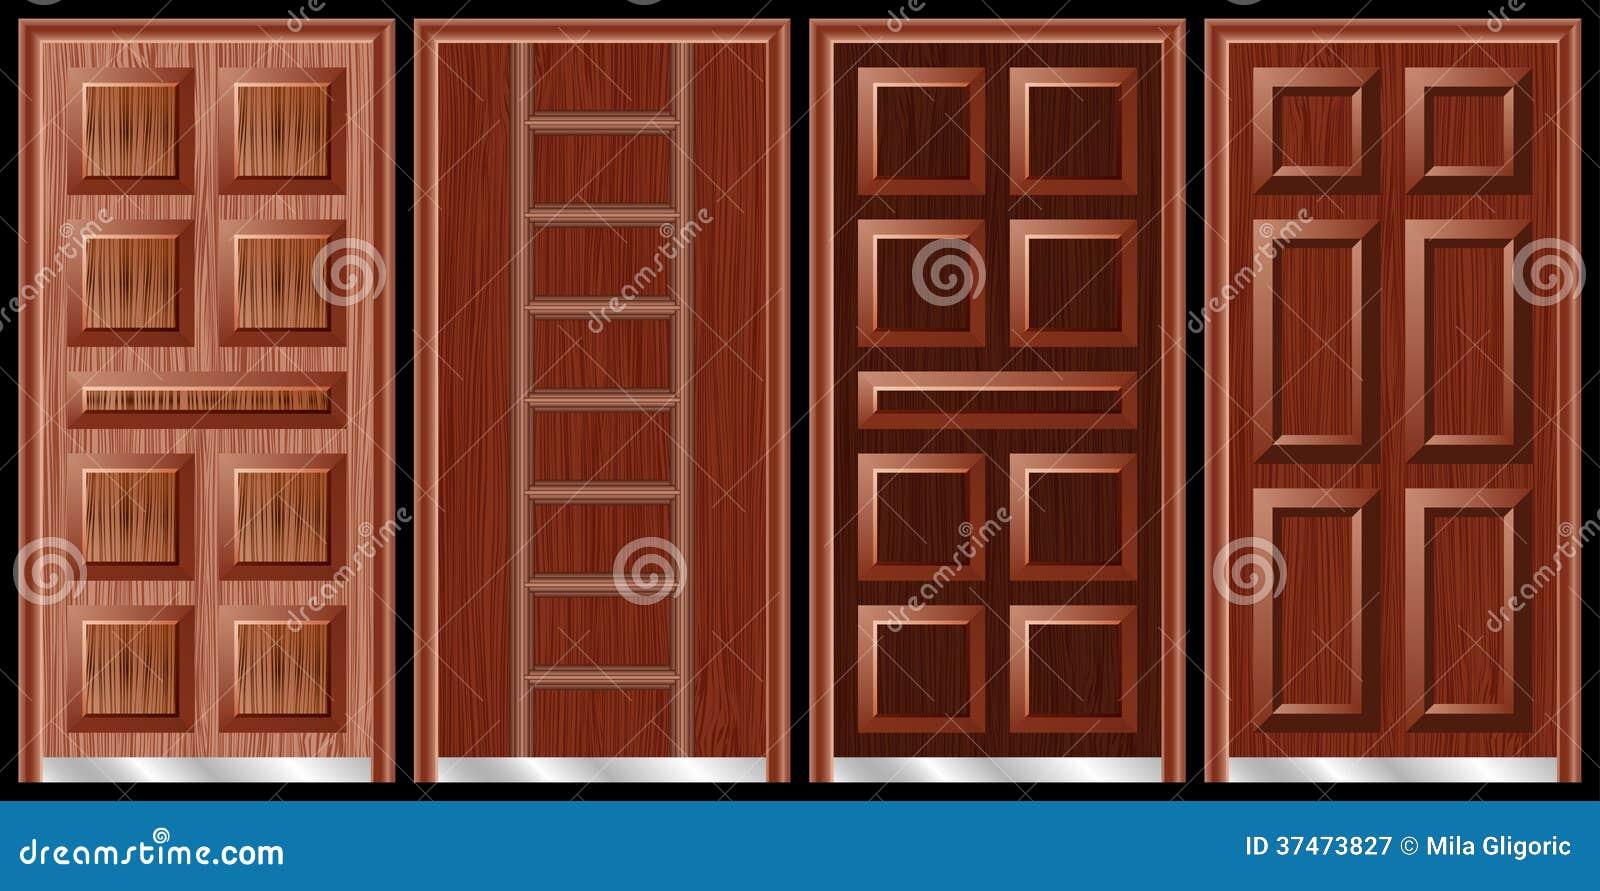 Wooden doors black royalty free stock photography image for Different door designs